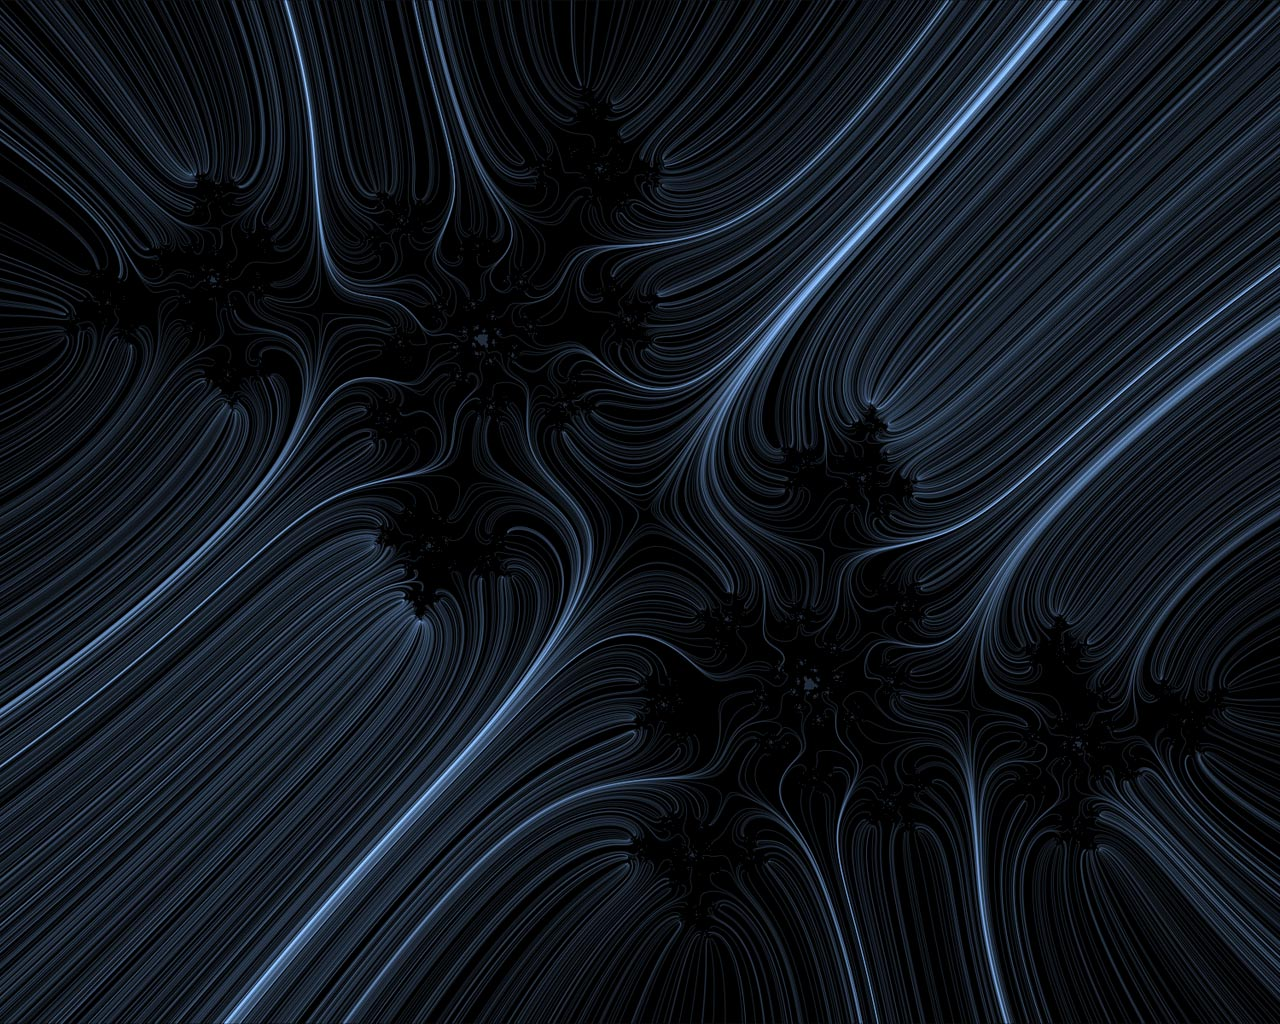 Free Background